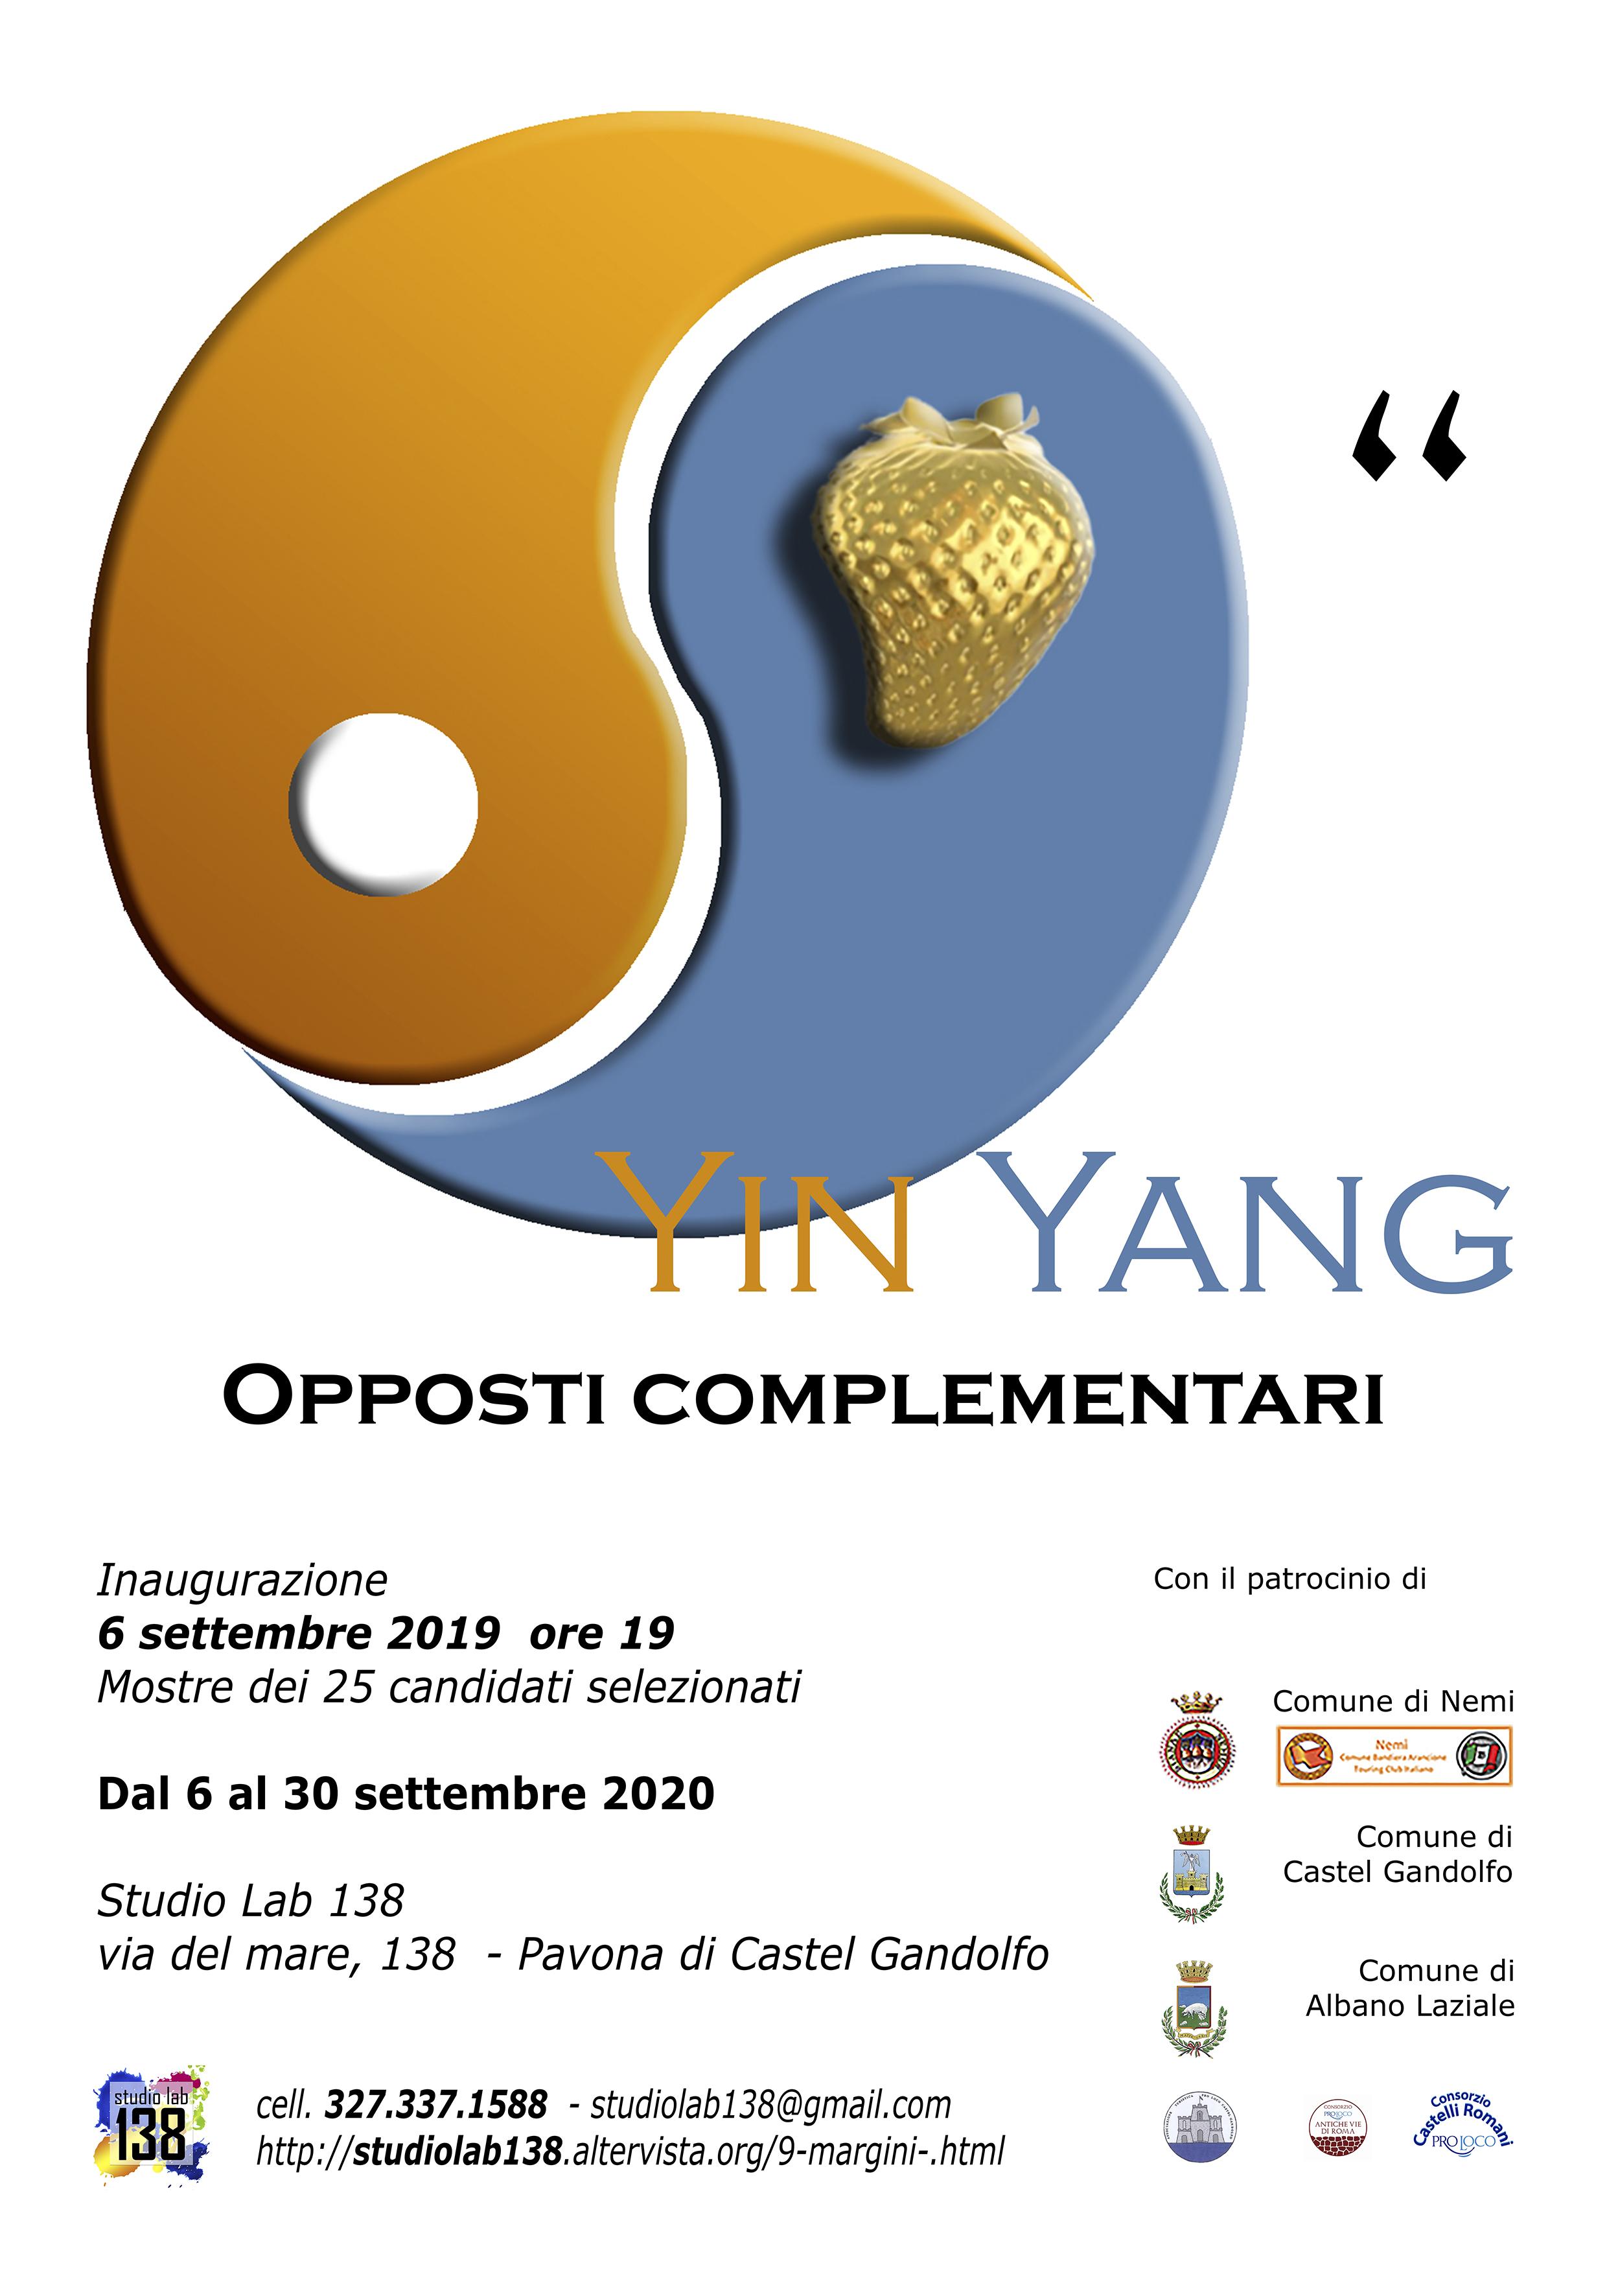 Yin Yang. Opposti complementari